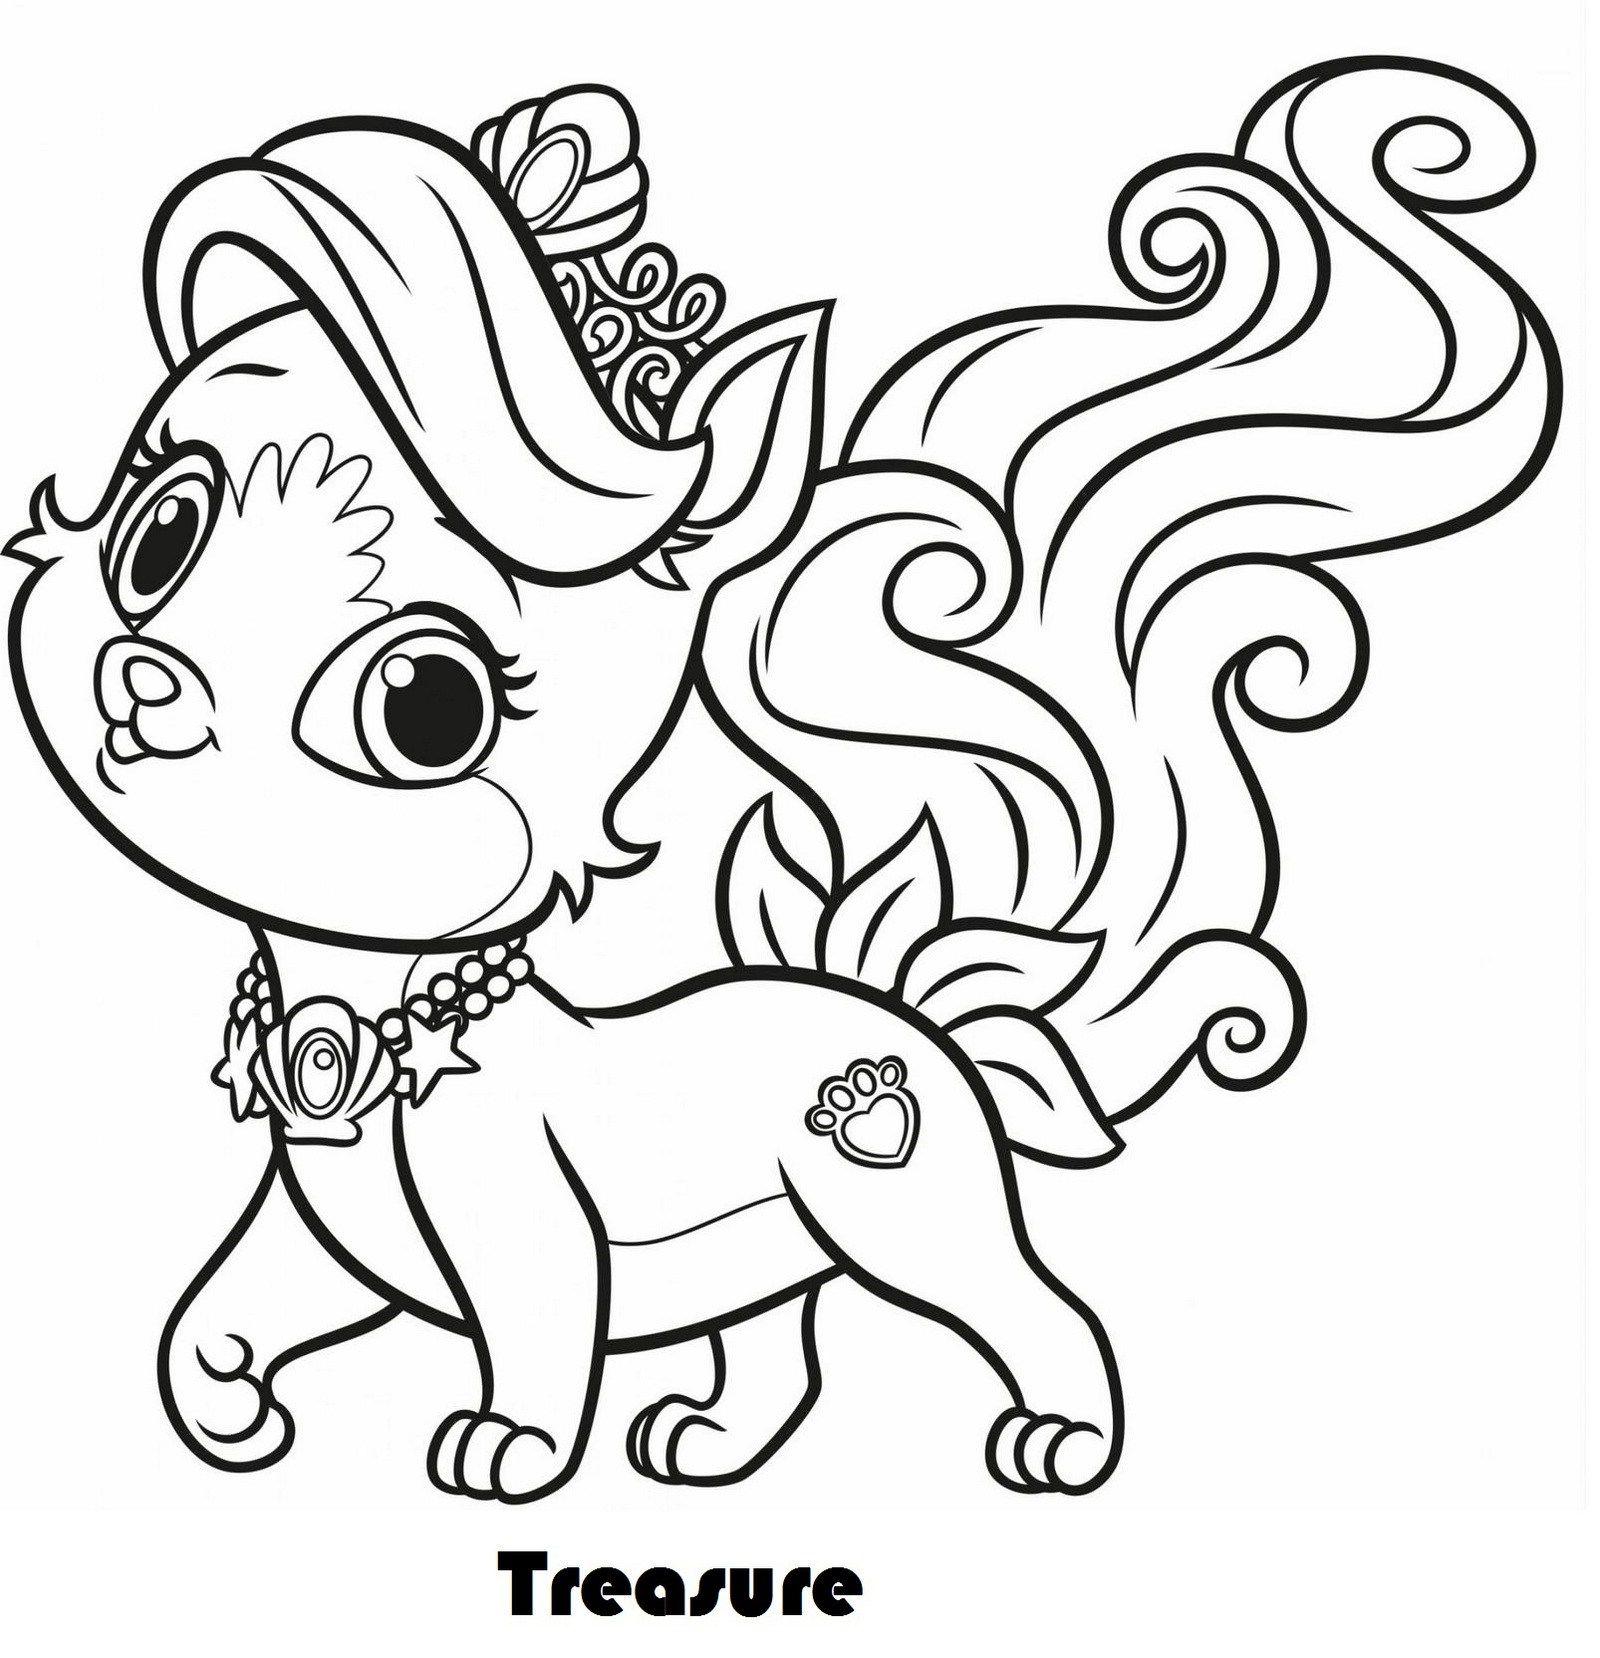 Treasure From Palace Pets Coloring Pages | Princess Disney Coloring ...